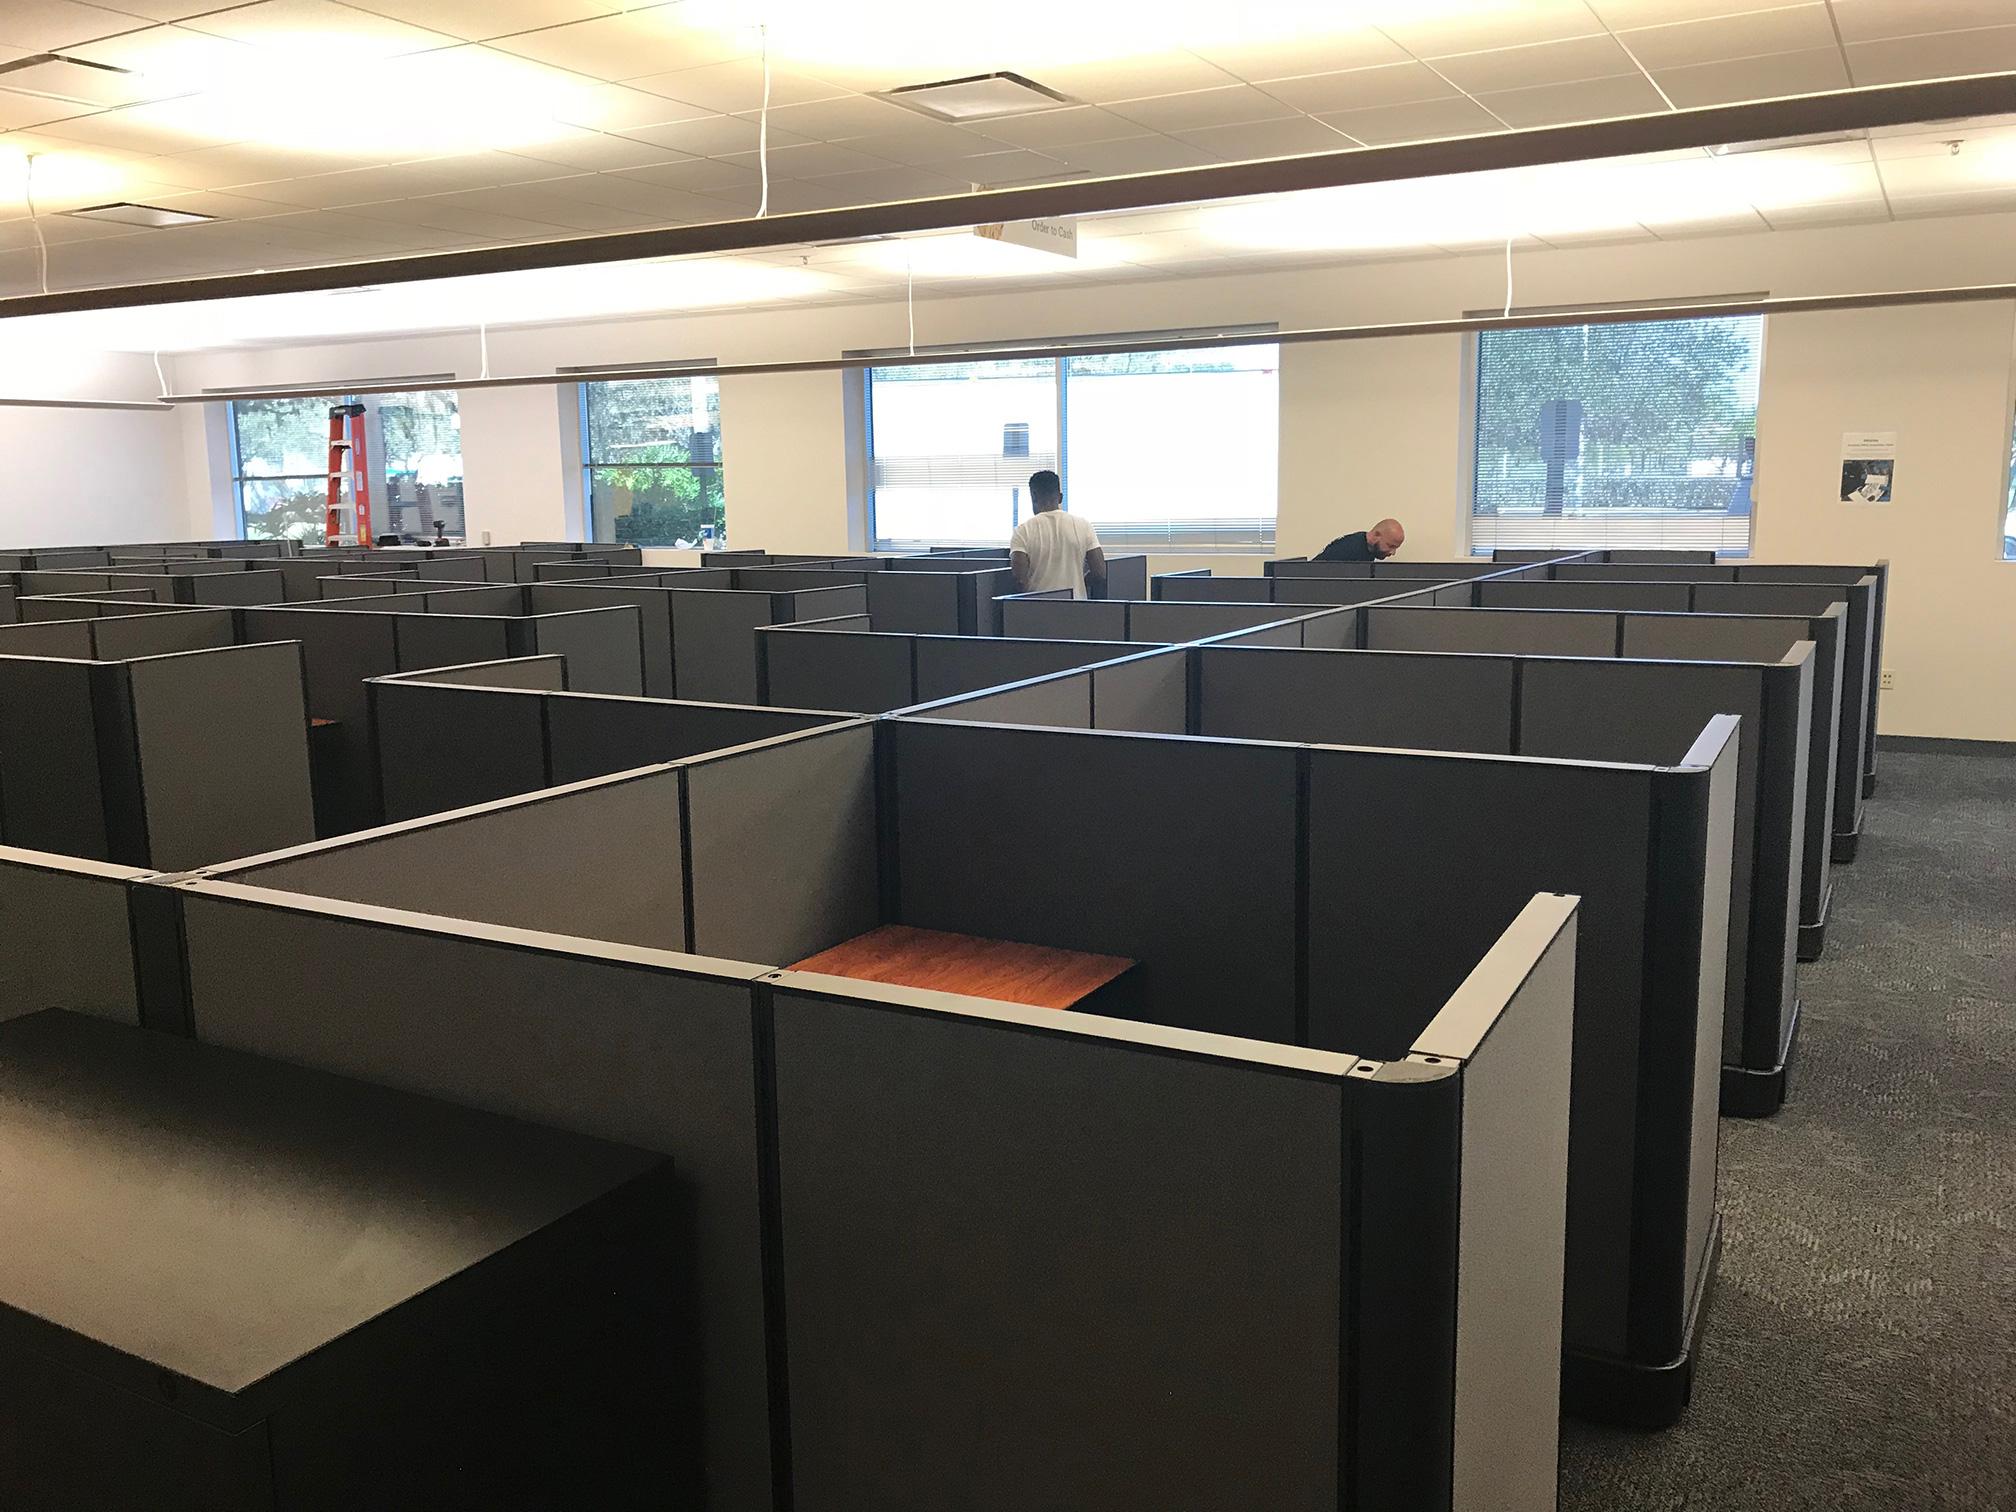 modern-cubicles-for-sale-manasota-office-supplies-llc.jpg